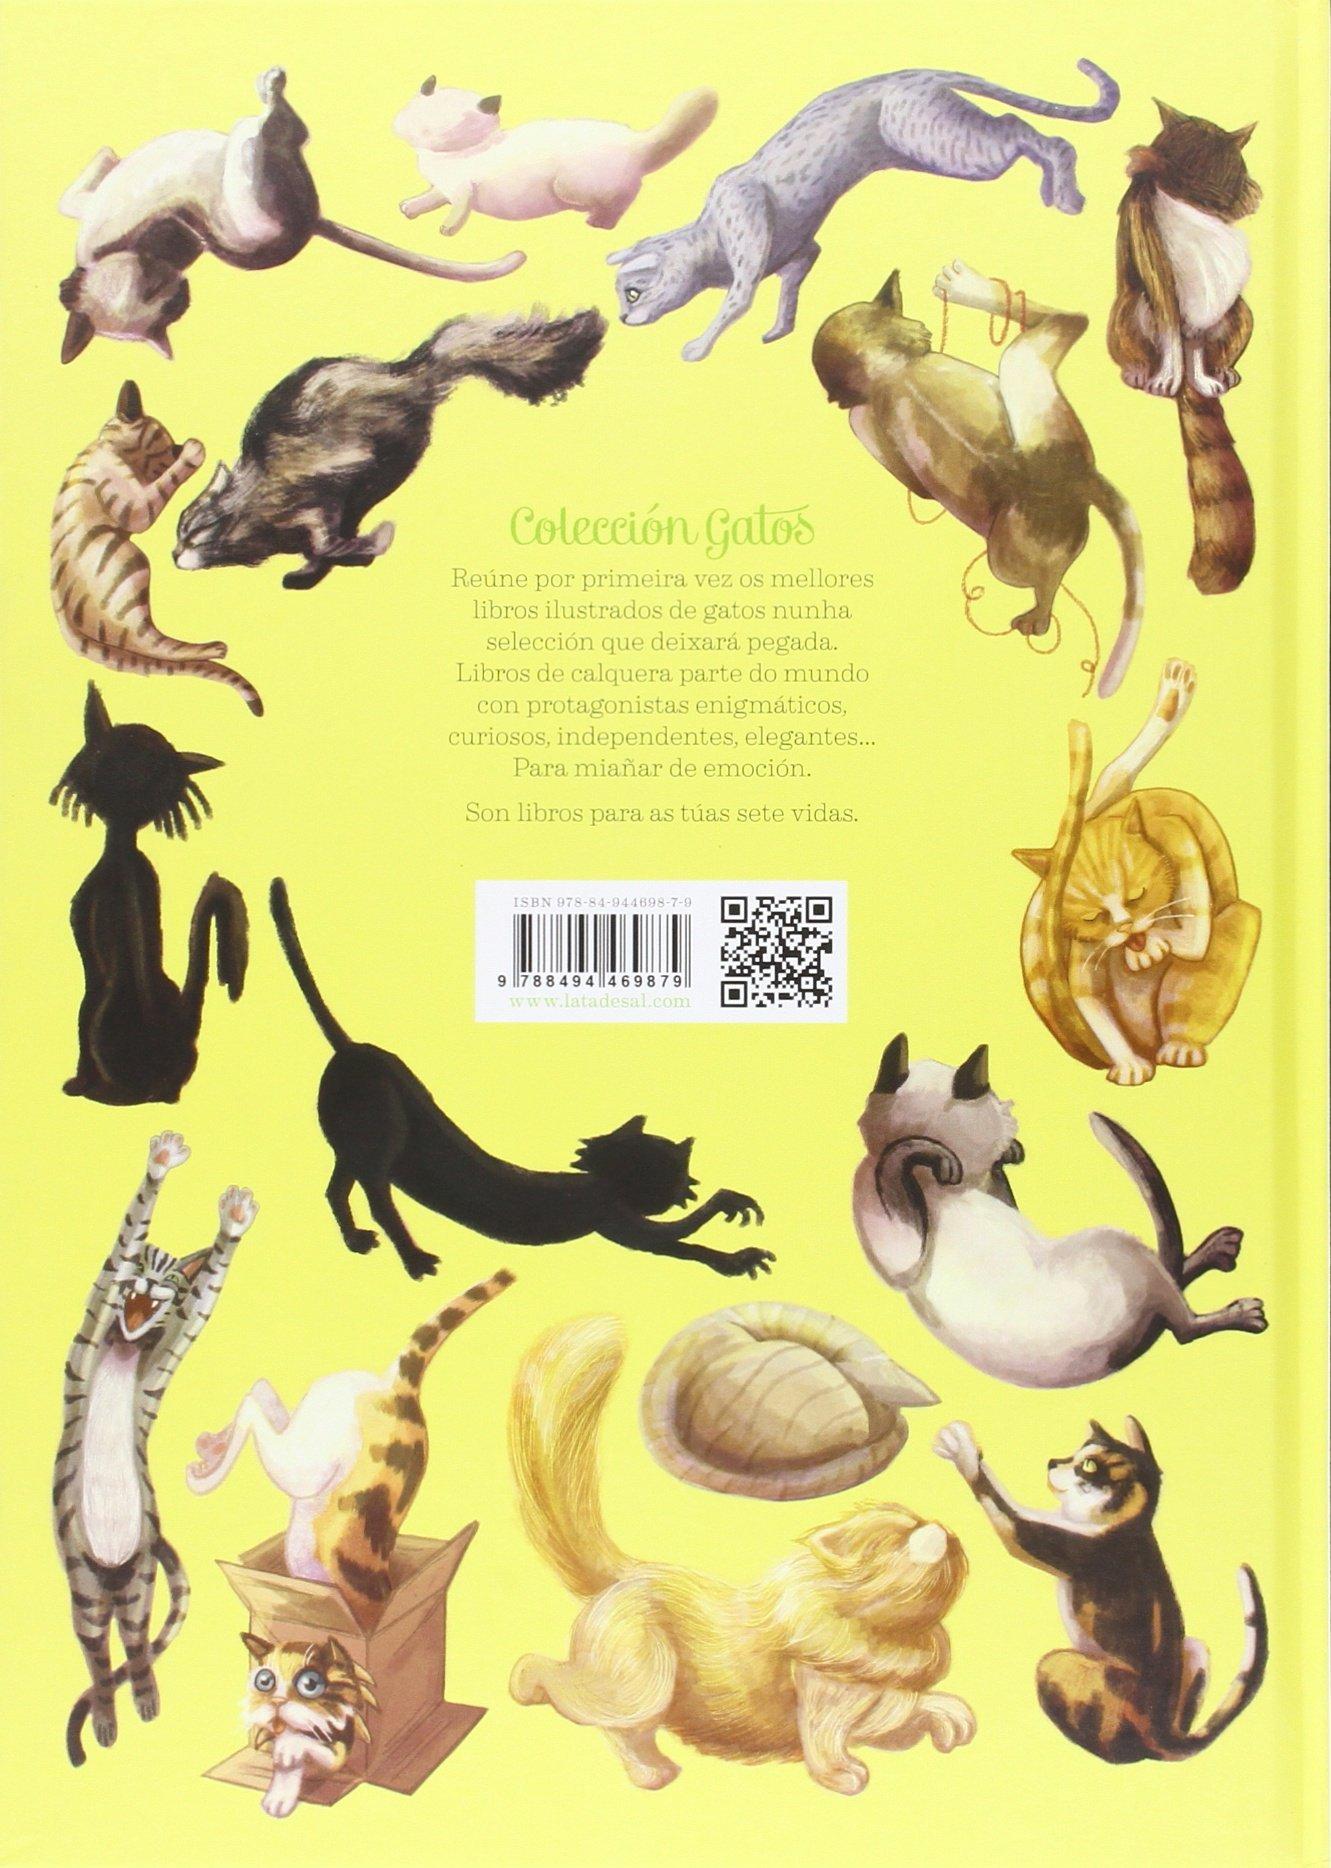 Breve Gatopedia Ilustrada: Zoraida Zaro Soto: 9788494469879: Amazon.com: Books